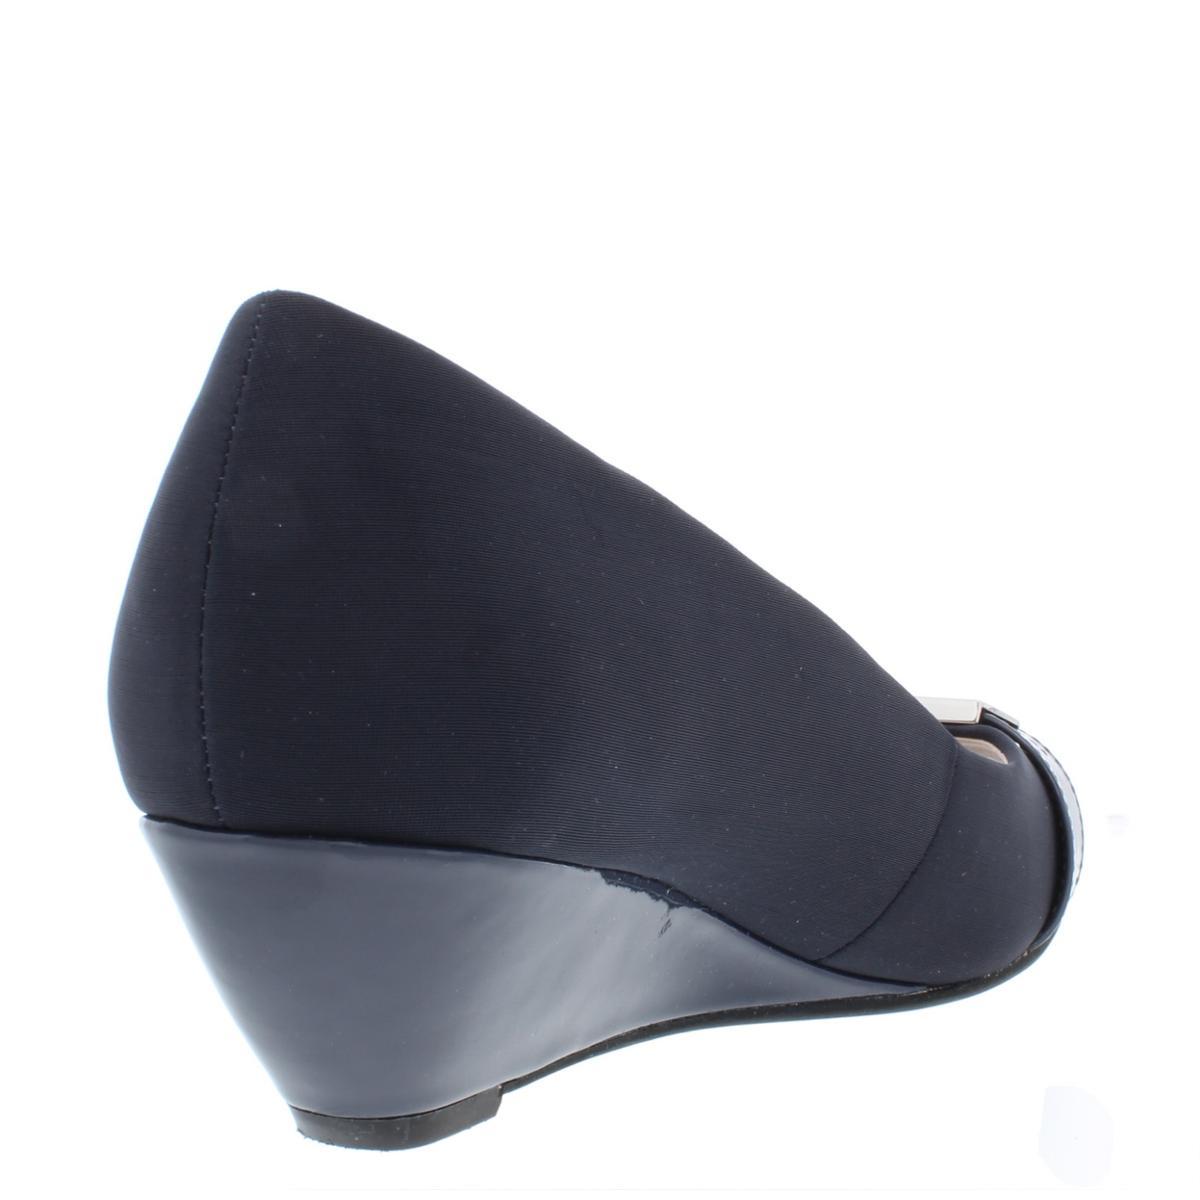 Alfani-Womens-Chorde-Patent-Open-Toe-Pumps-Wedge-Heels-Shoes-BHFO-9351 thumbnail 4